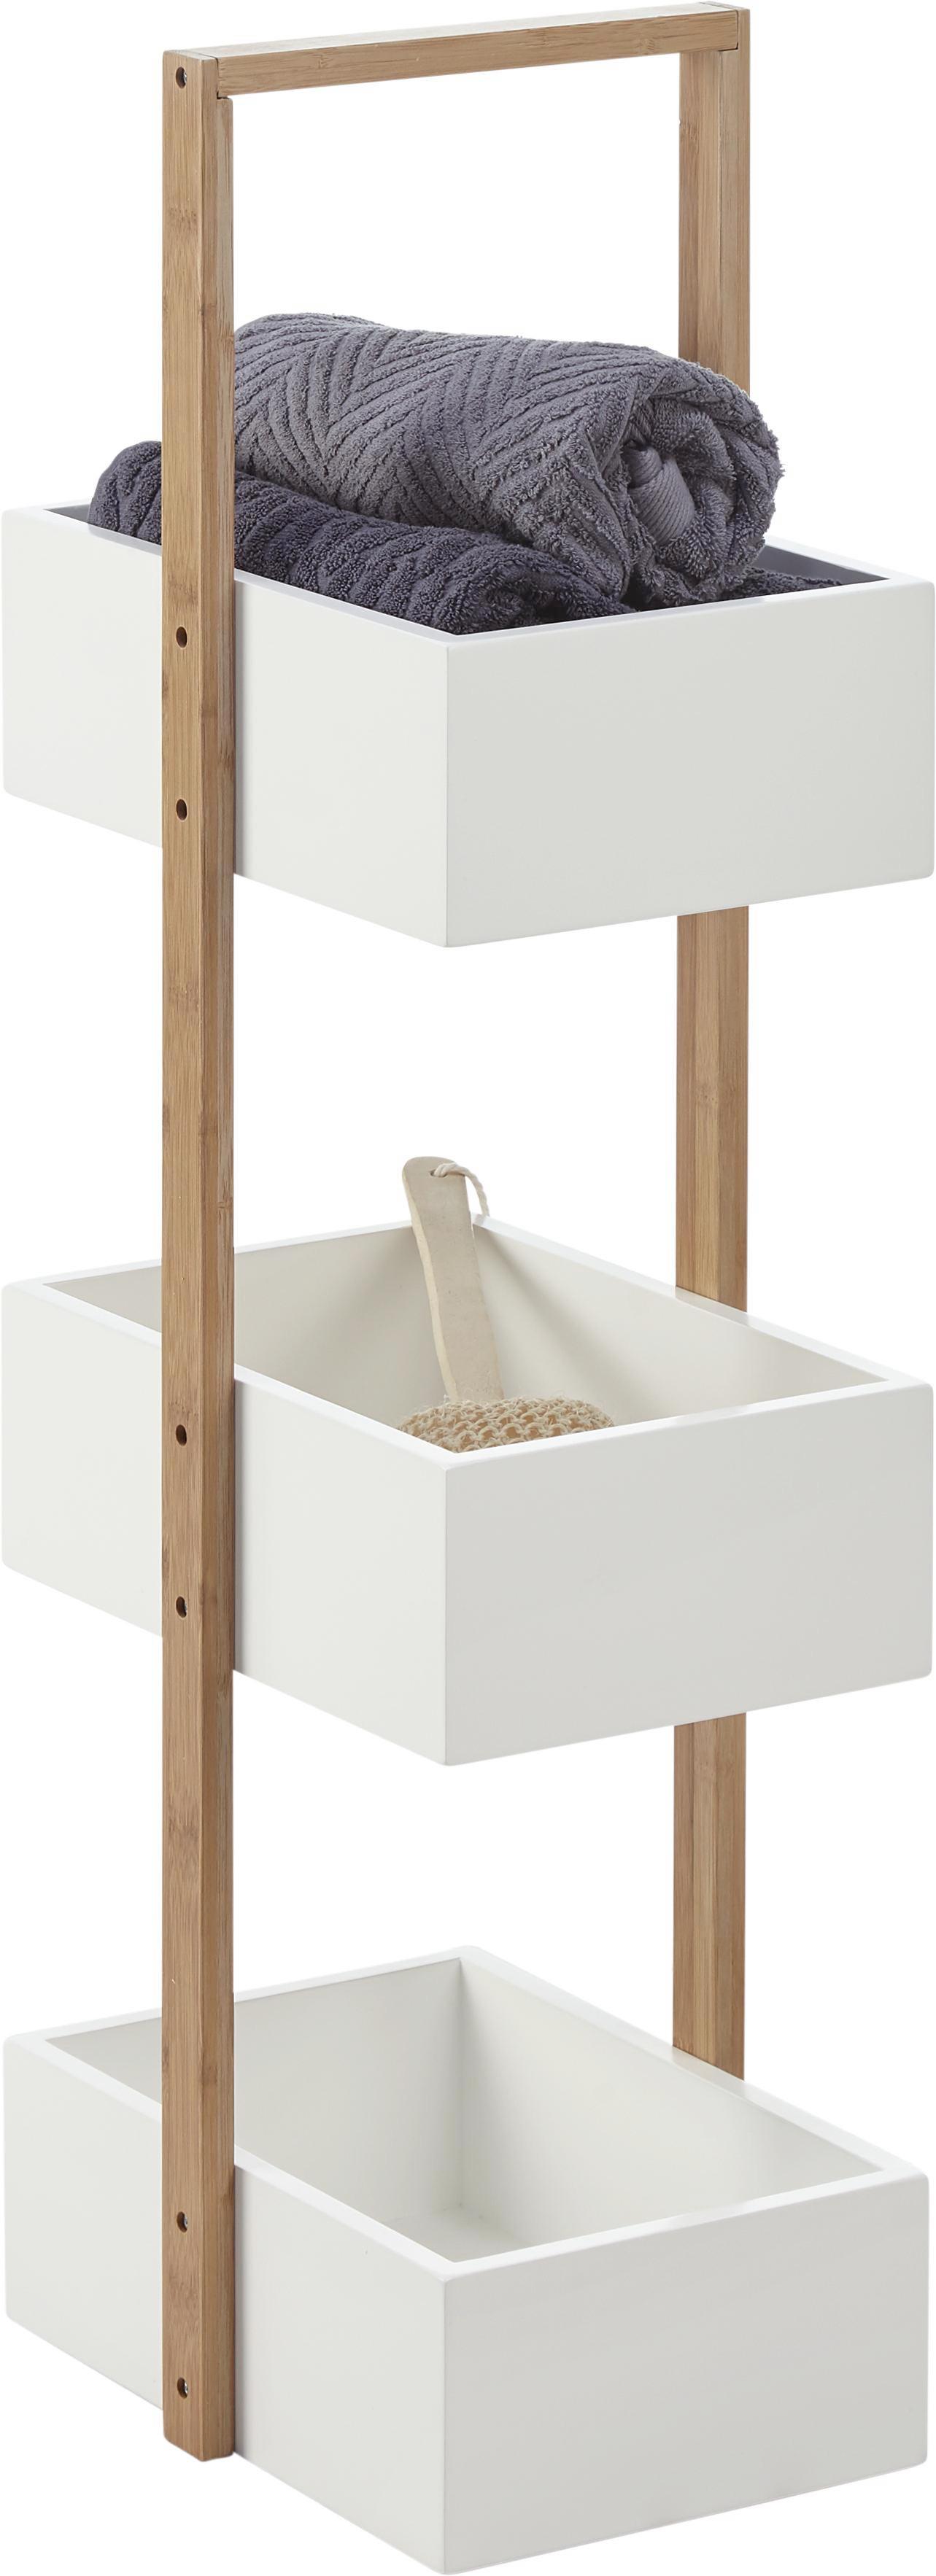 Superb Badezimmer Regal #8: Badezimmerregal Mirella - Naturfarben/Weiß, MODERN, Holz (32/89,5